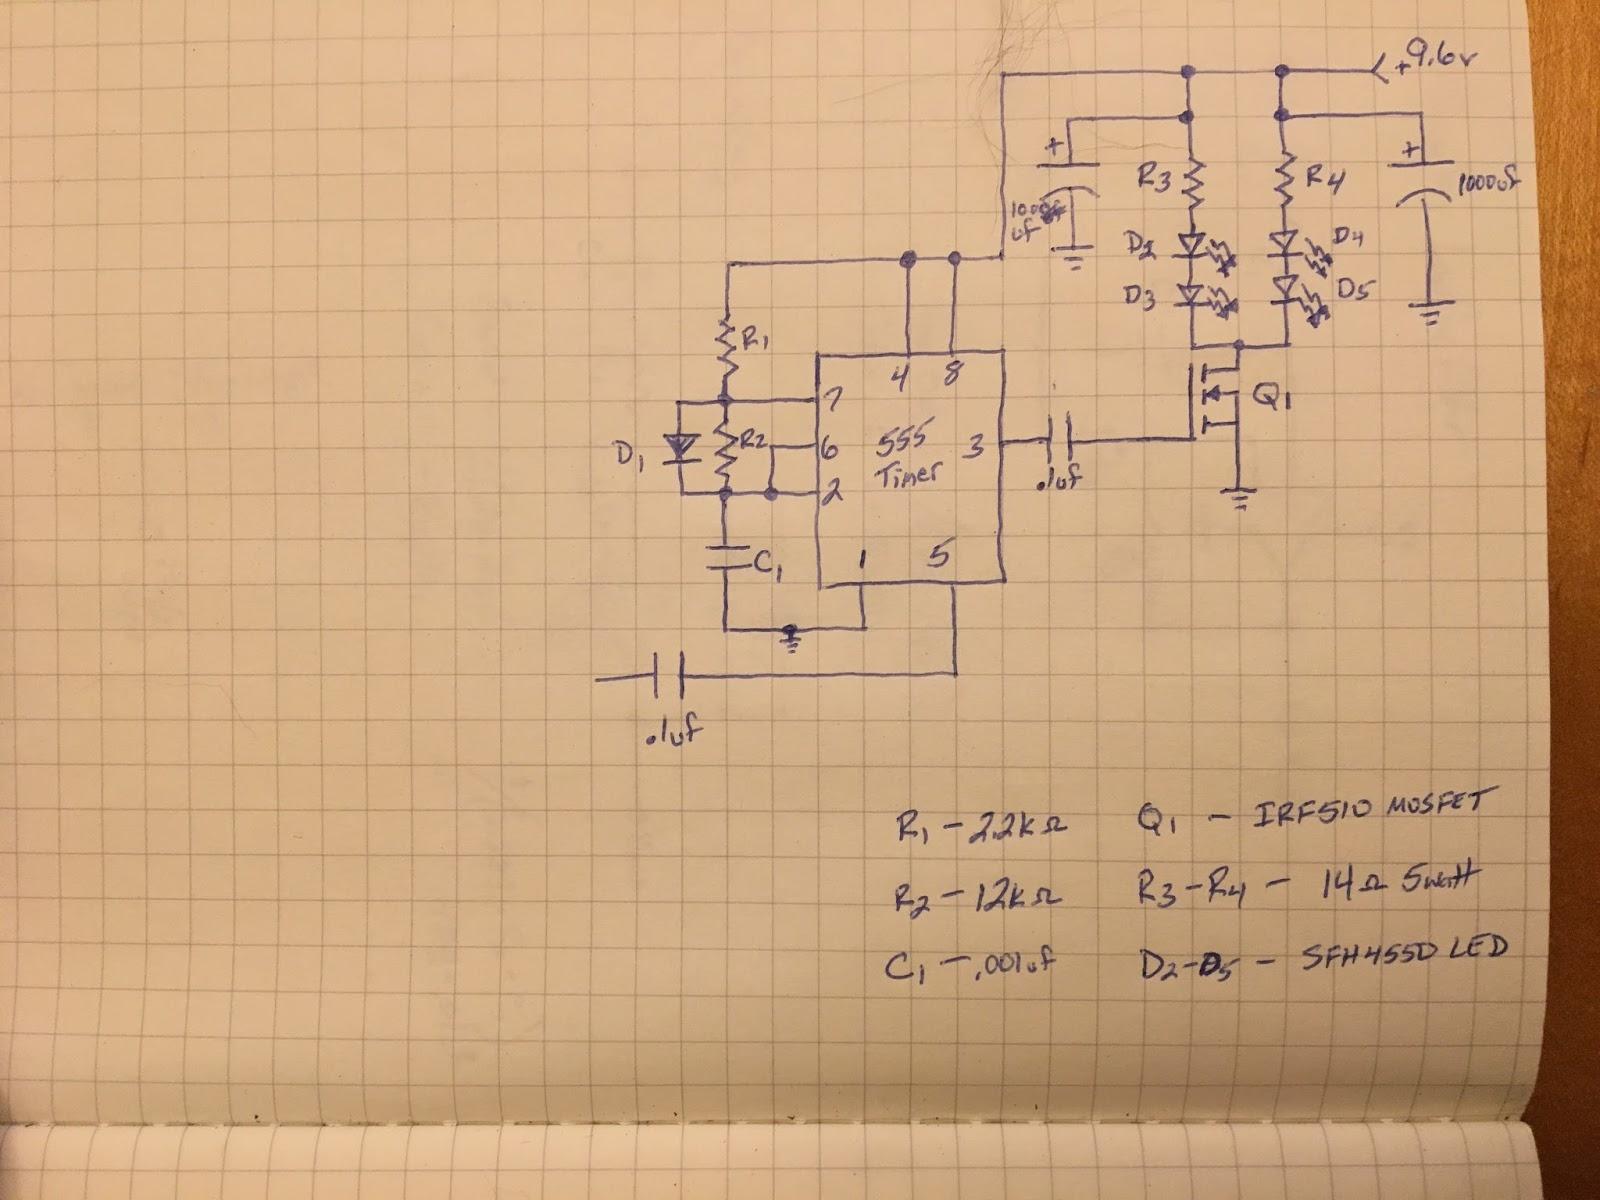 Wf0t Gigahertz To Terahertz 2017 555 Timer Astable Mode Pwm Circuit